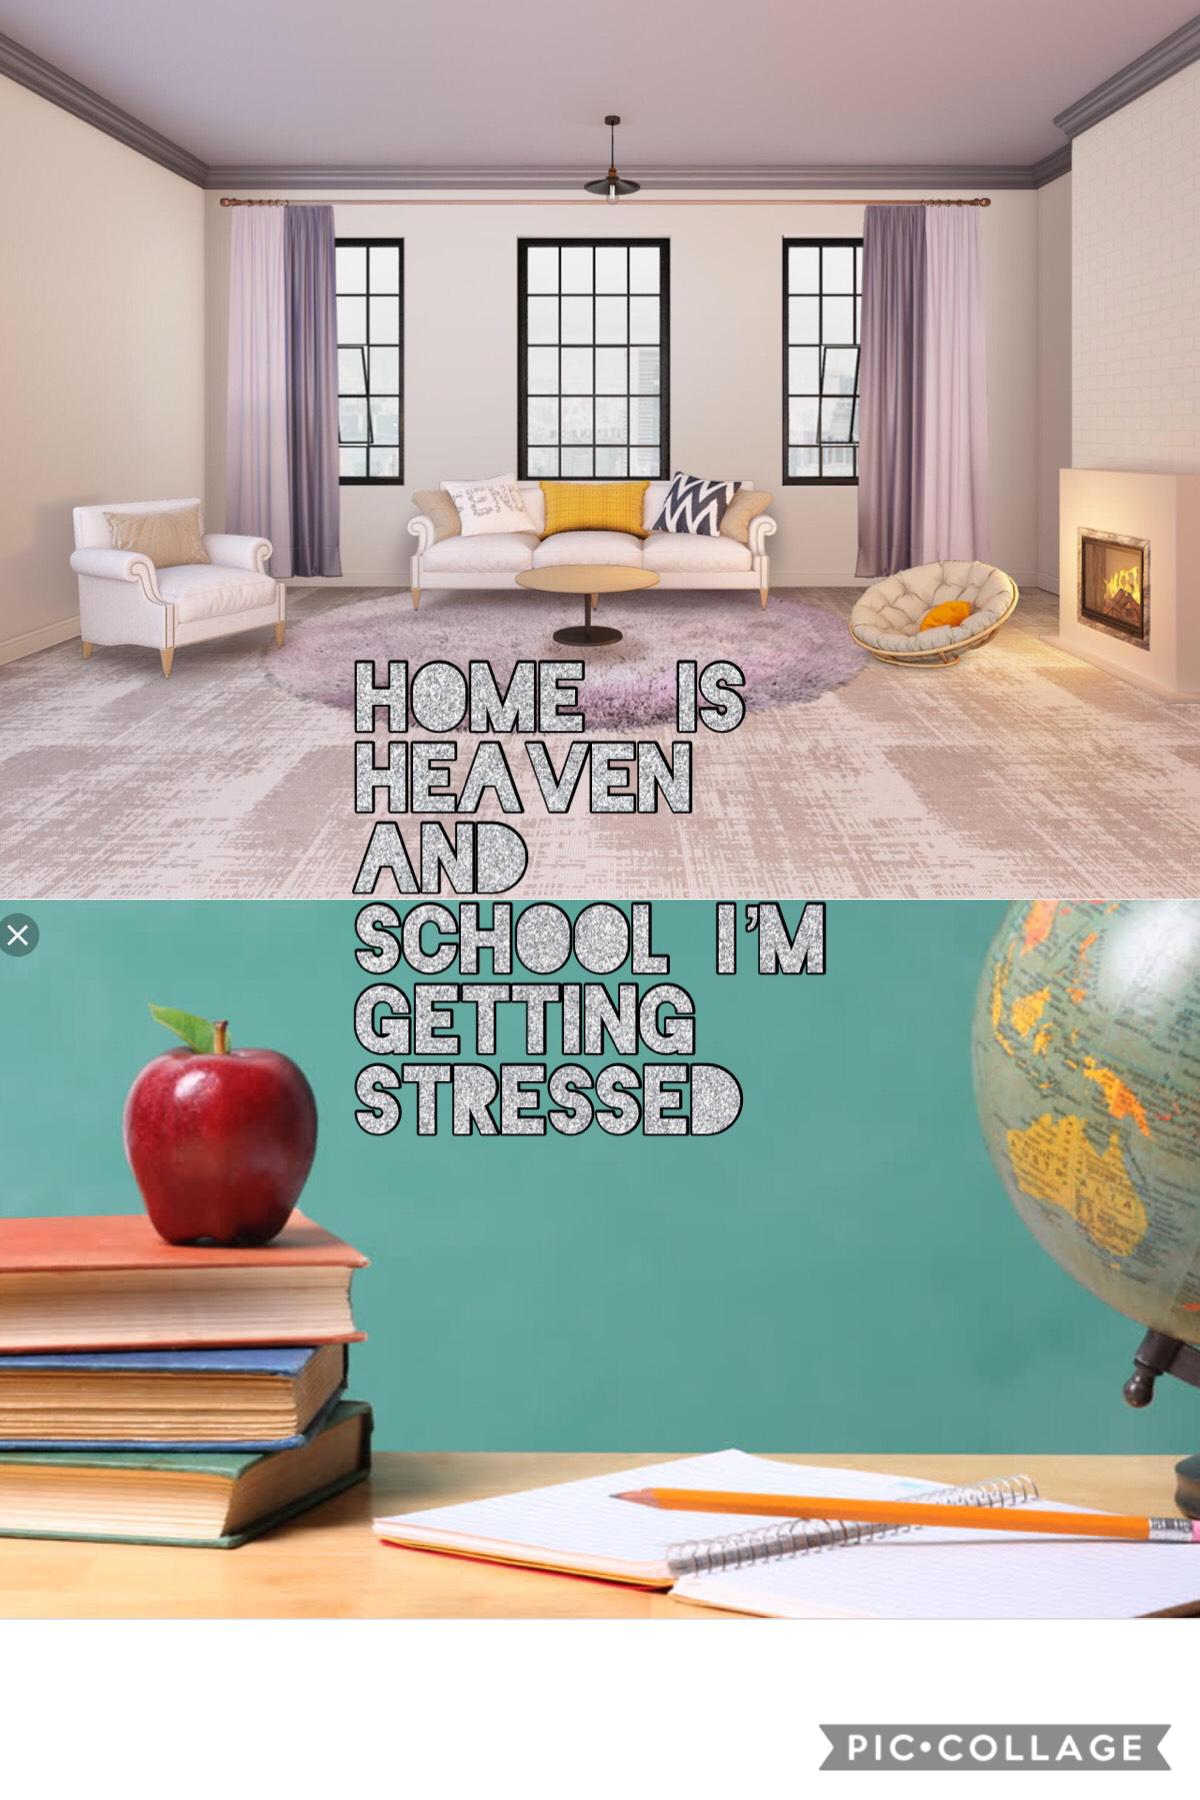 Home vs school